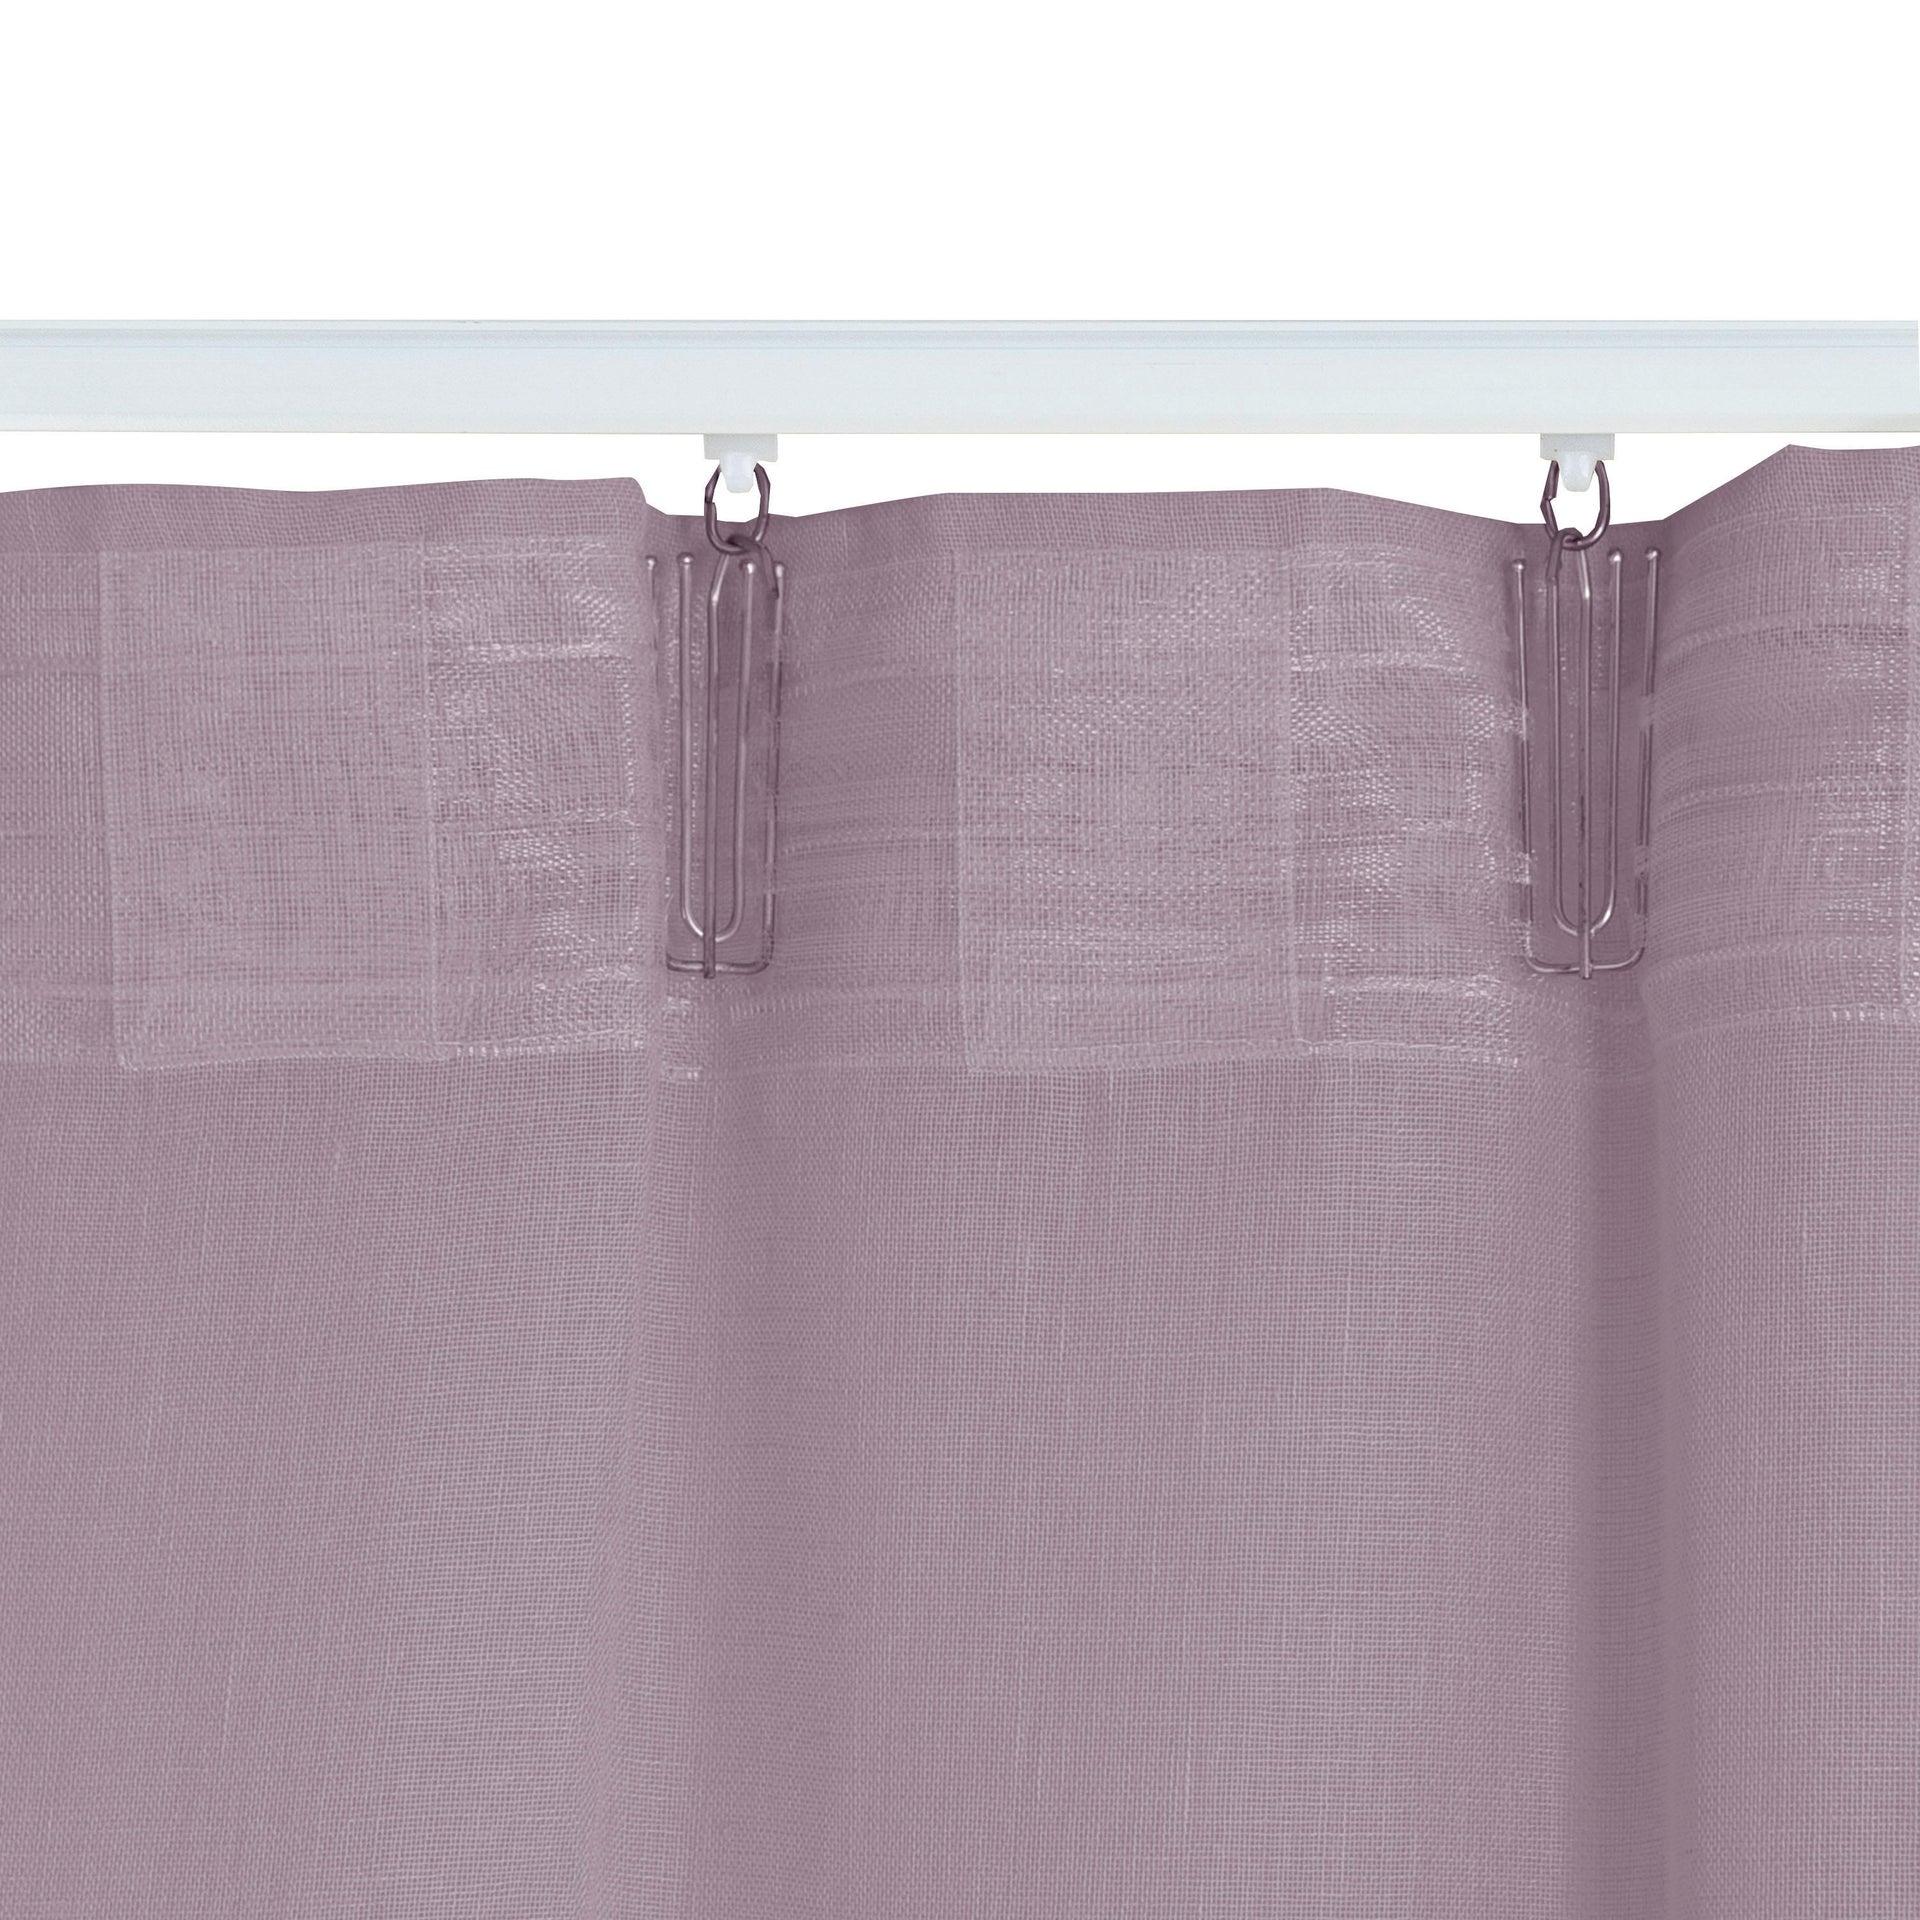 Tenda INSPIRE Abby viola fettuccia e passanti 200 x 280 cm - 4